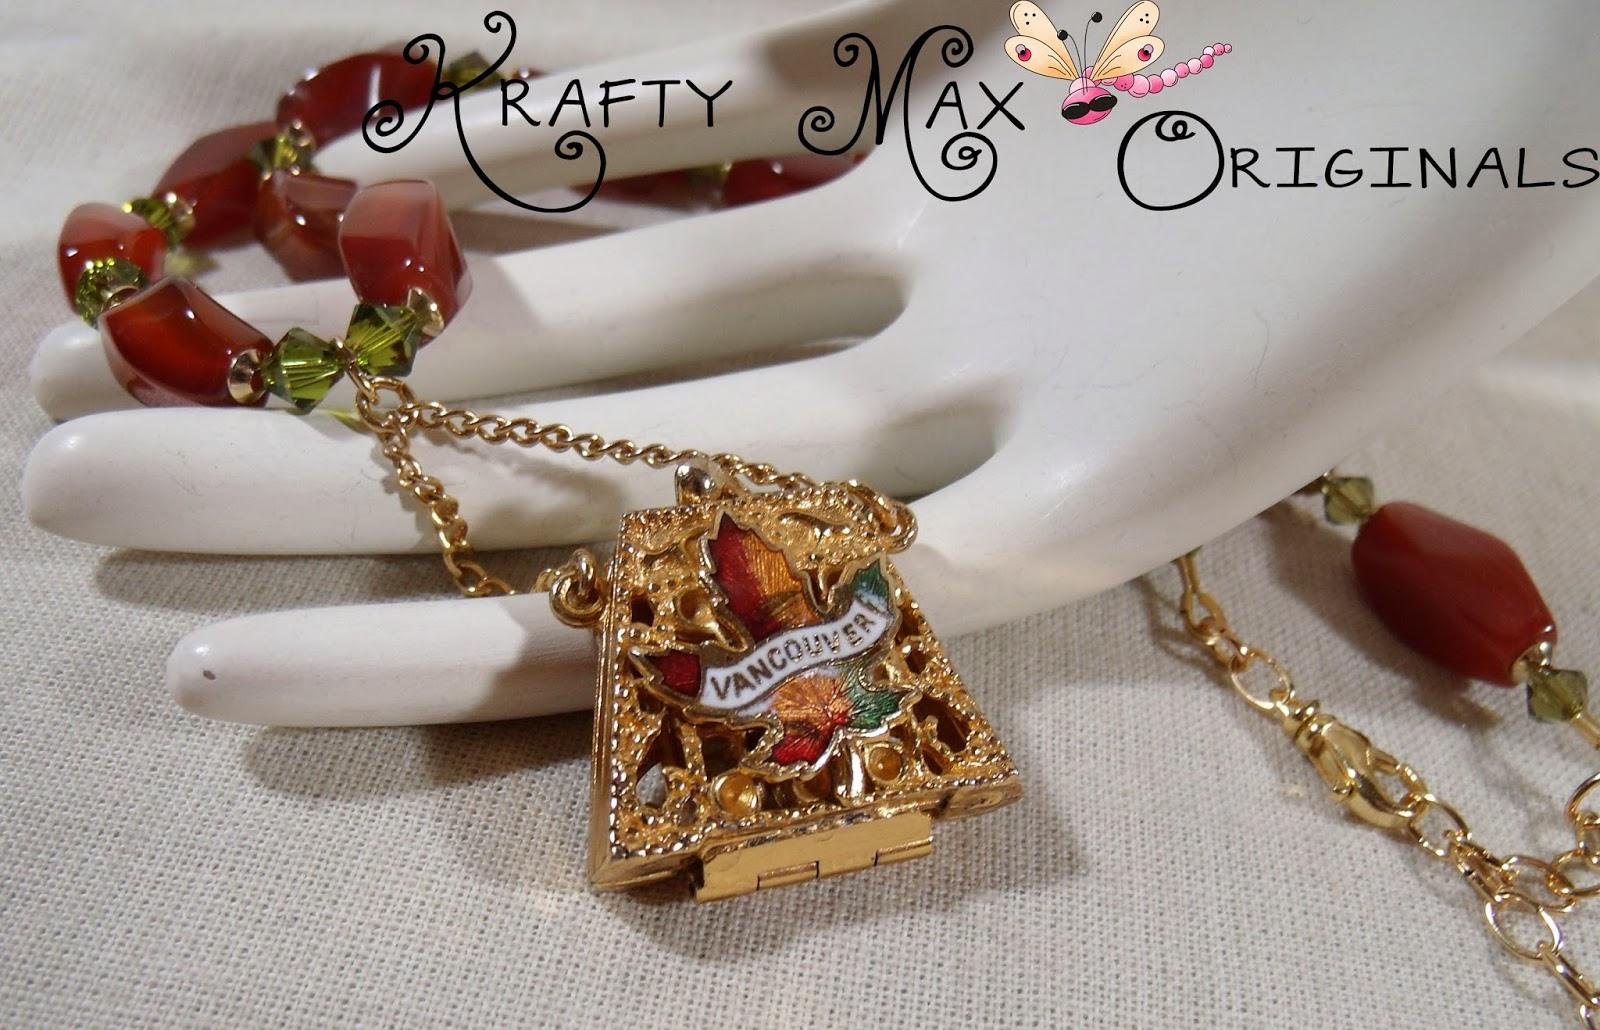 http://www.lajuliet.com/index.php/2013-01-04-15-21-51/ad/crystal,91/exclusive-vintage-vancouver-purse-swarovski-crystal-neckace-set-a-krafty-max-original-design,123